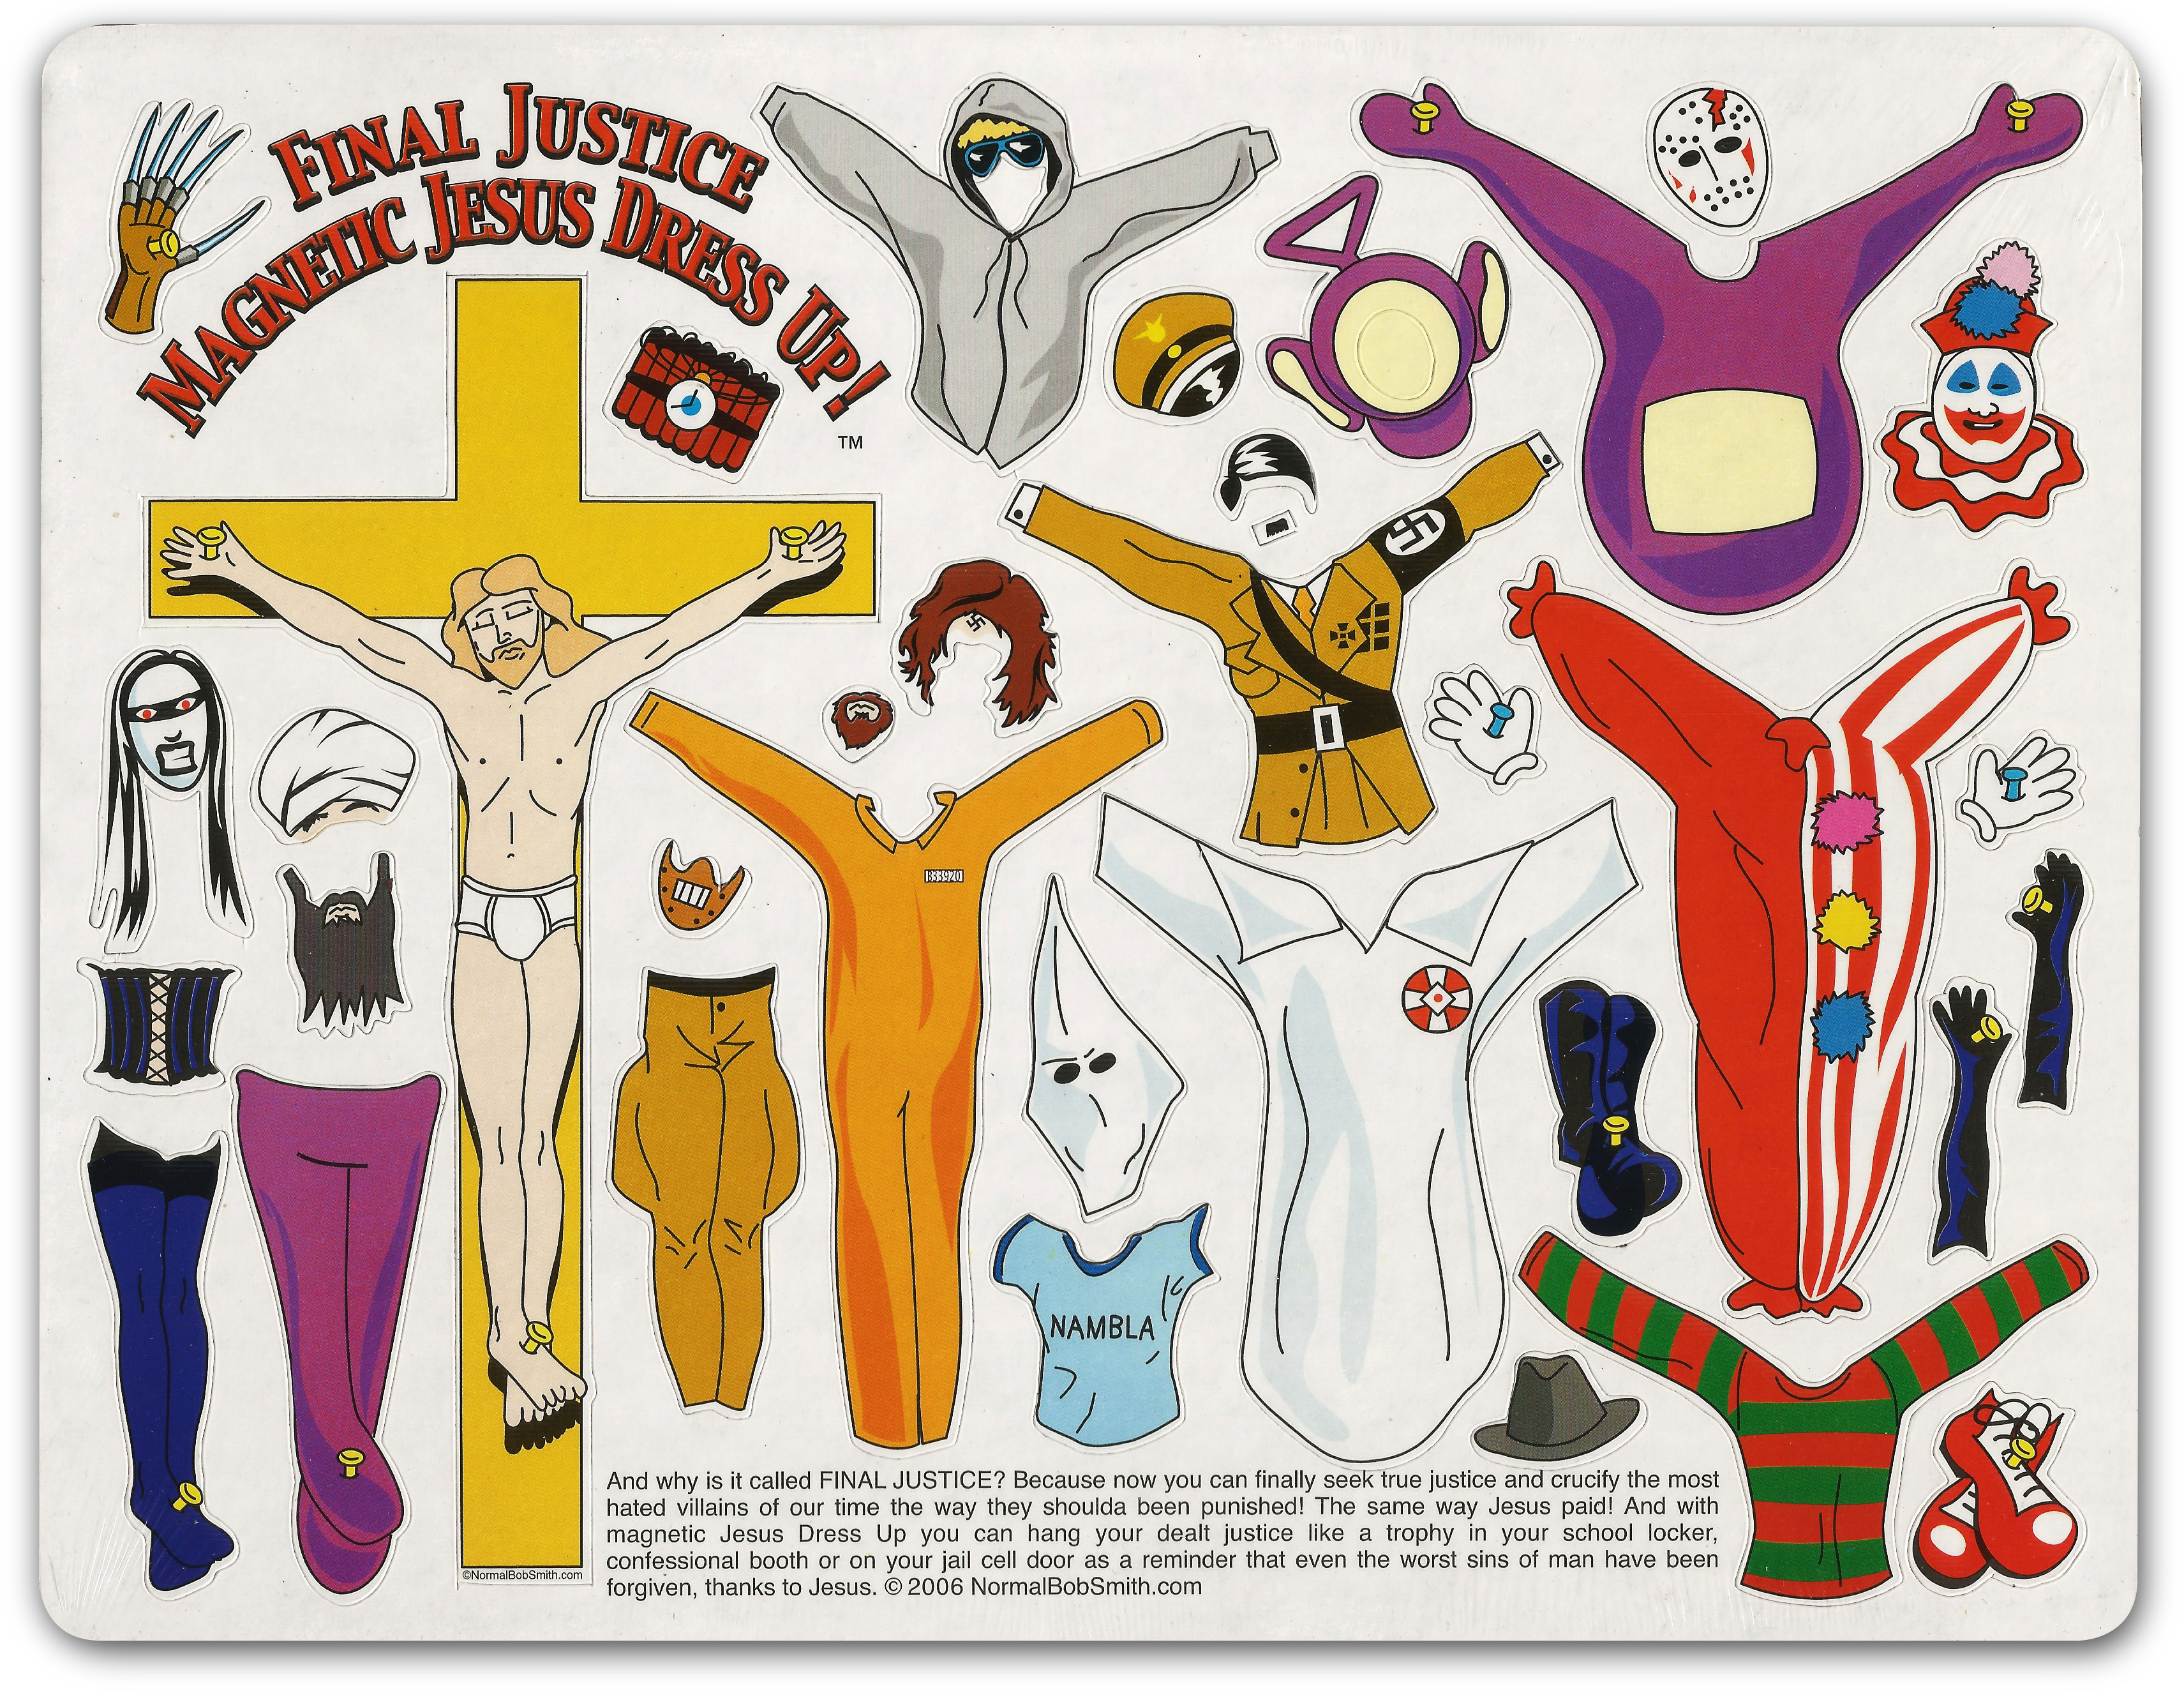 Final Justice Jesus Dressup 2006 $15